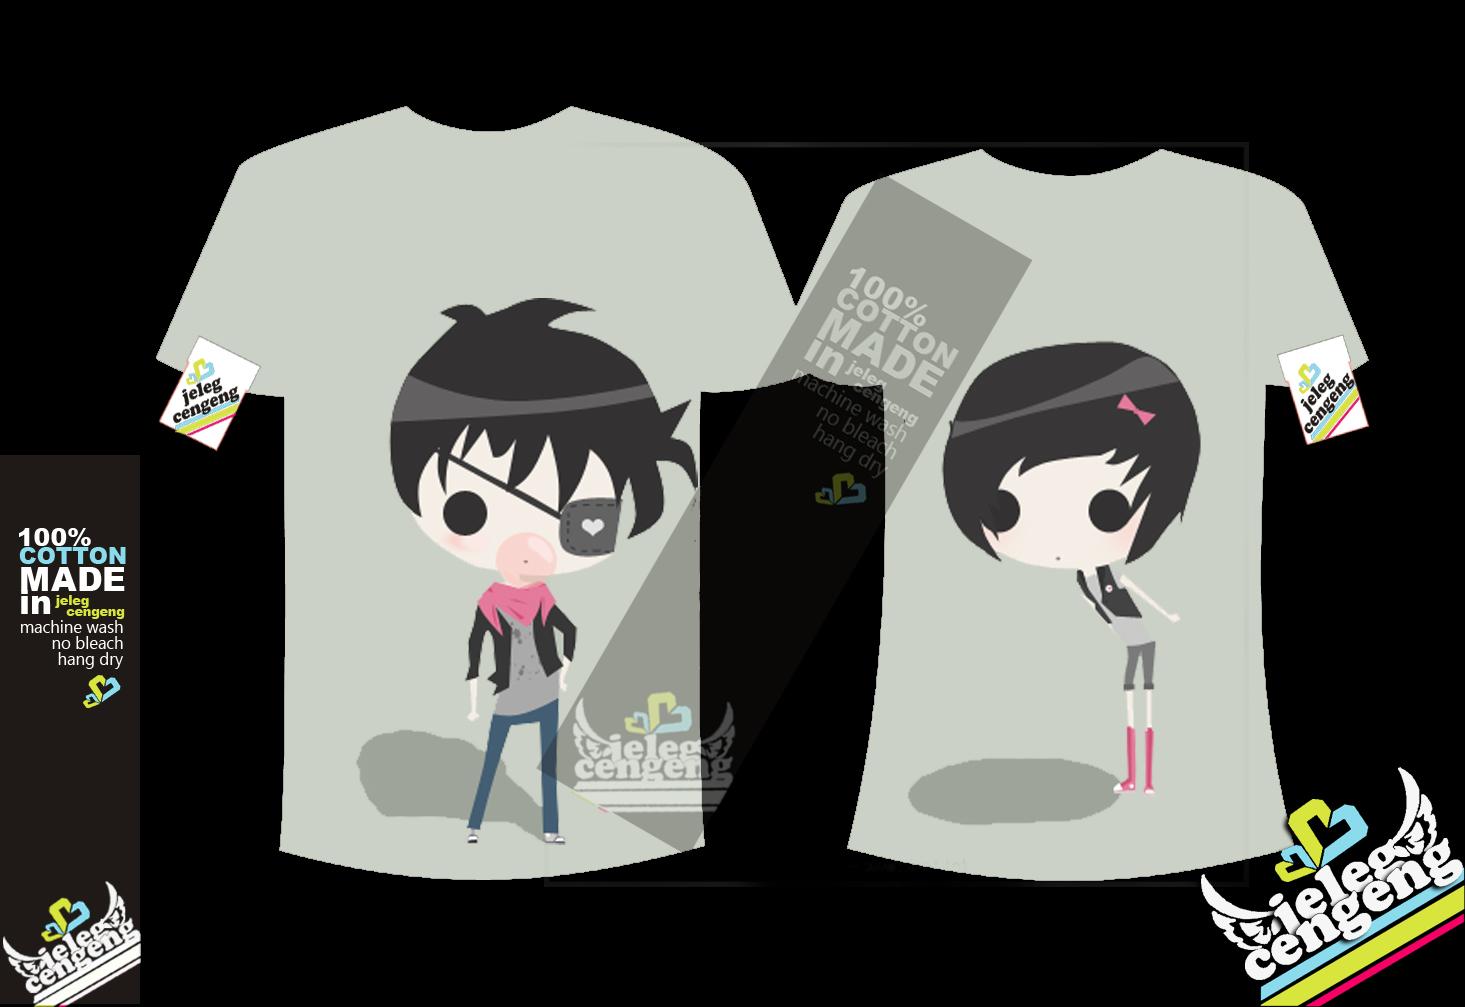 Contoh desain t shirt kelas - Kursus Komputer Jogja Murah Terbaik Contoh Desain Kaos Anime